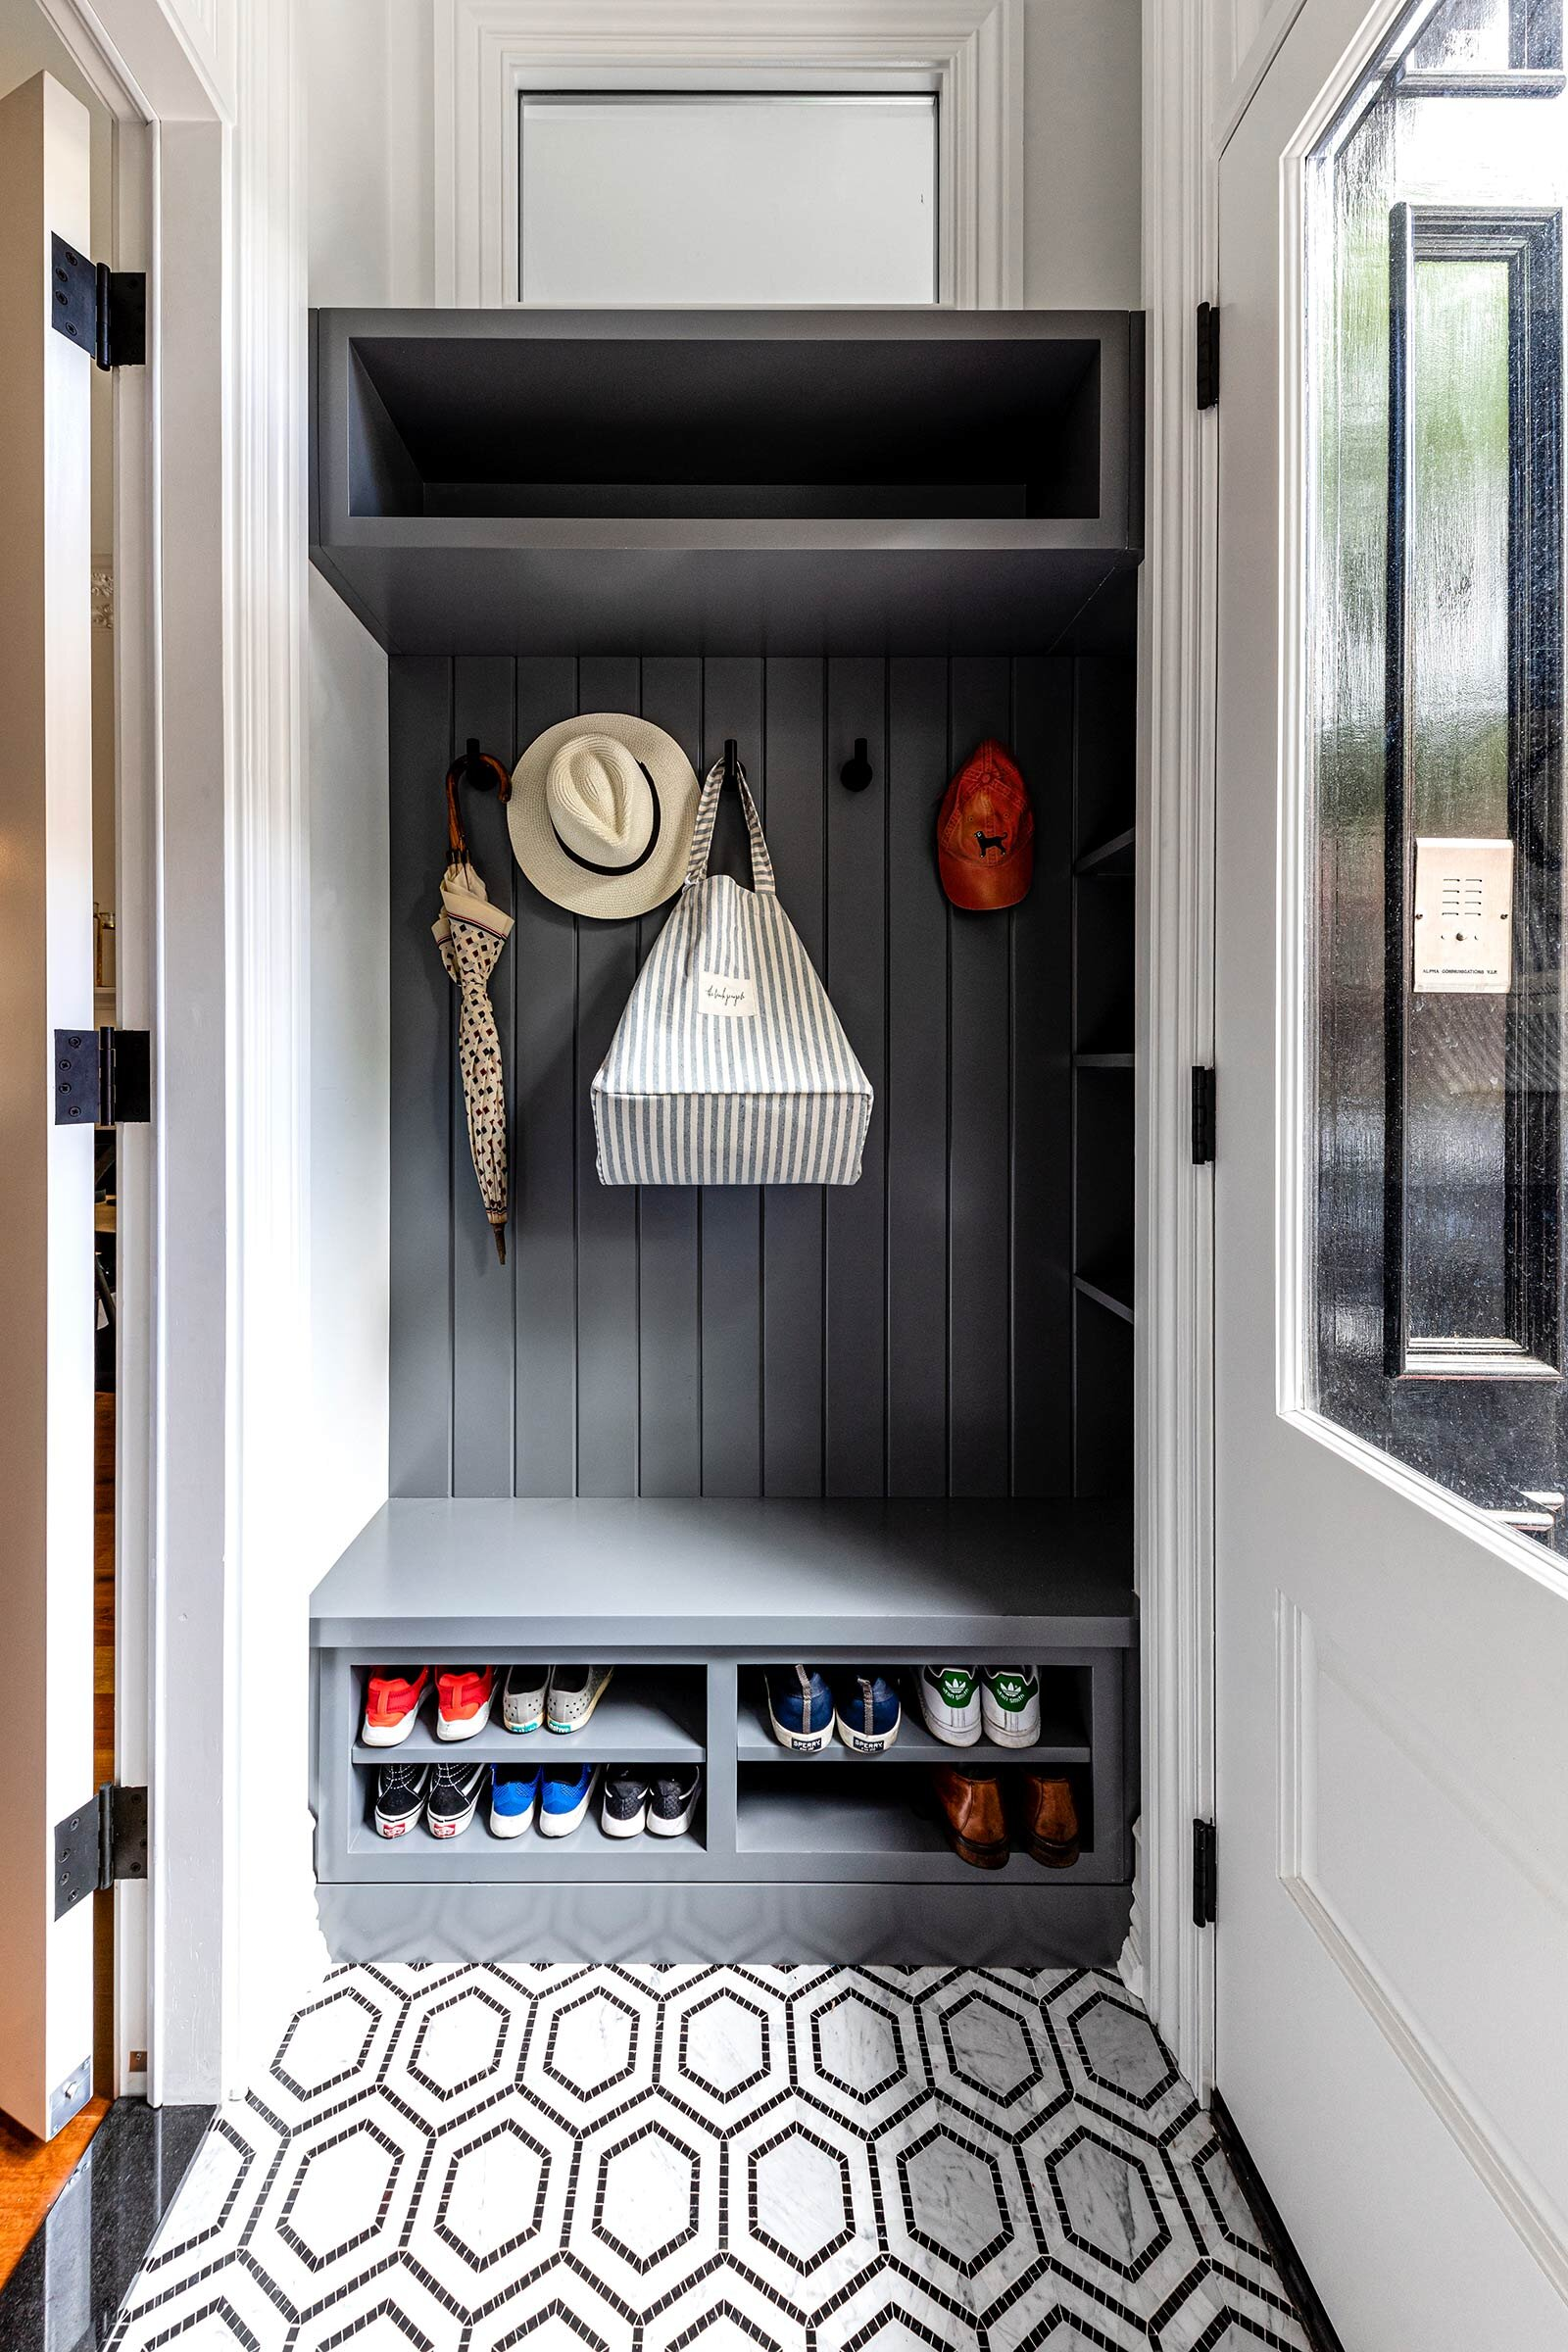 thompson-home-renovations-contractor-mudroom-vestibule-doorway-shoes.jpg